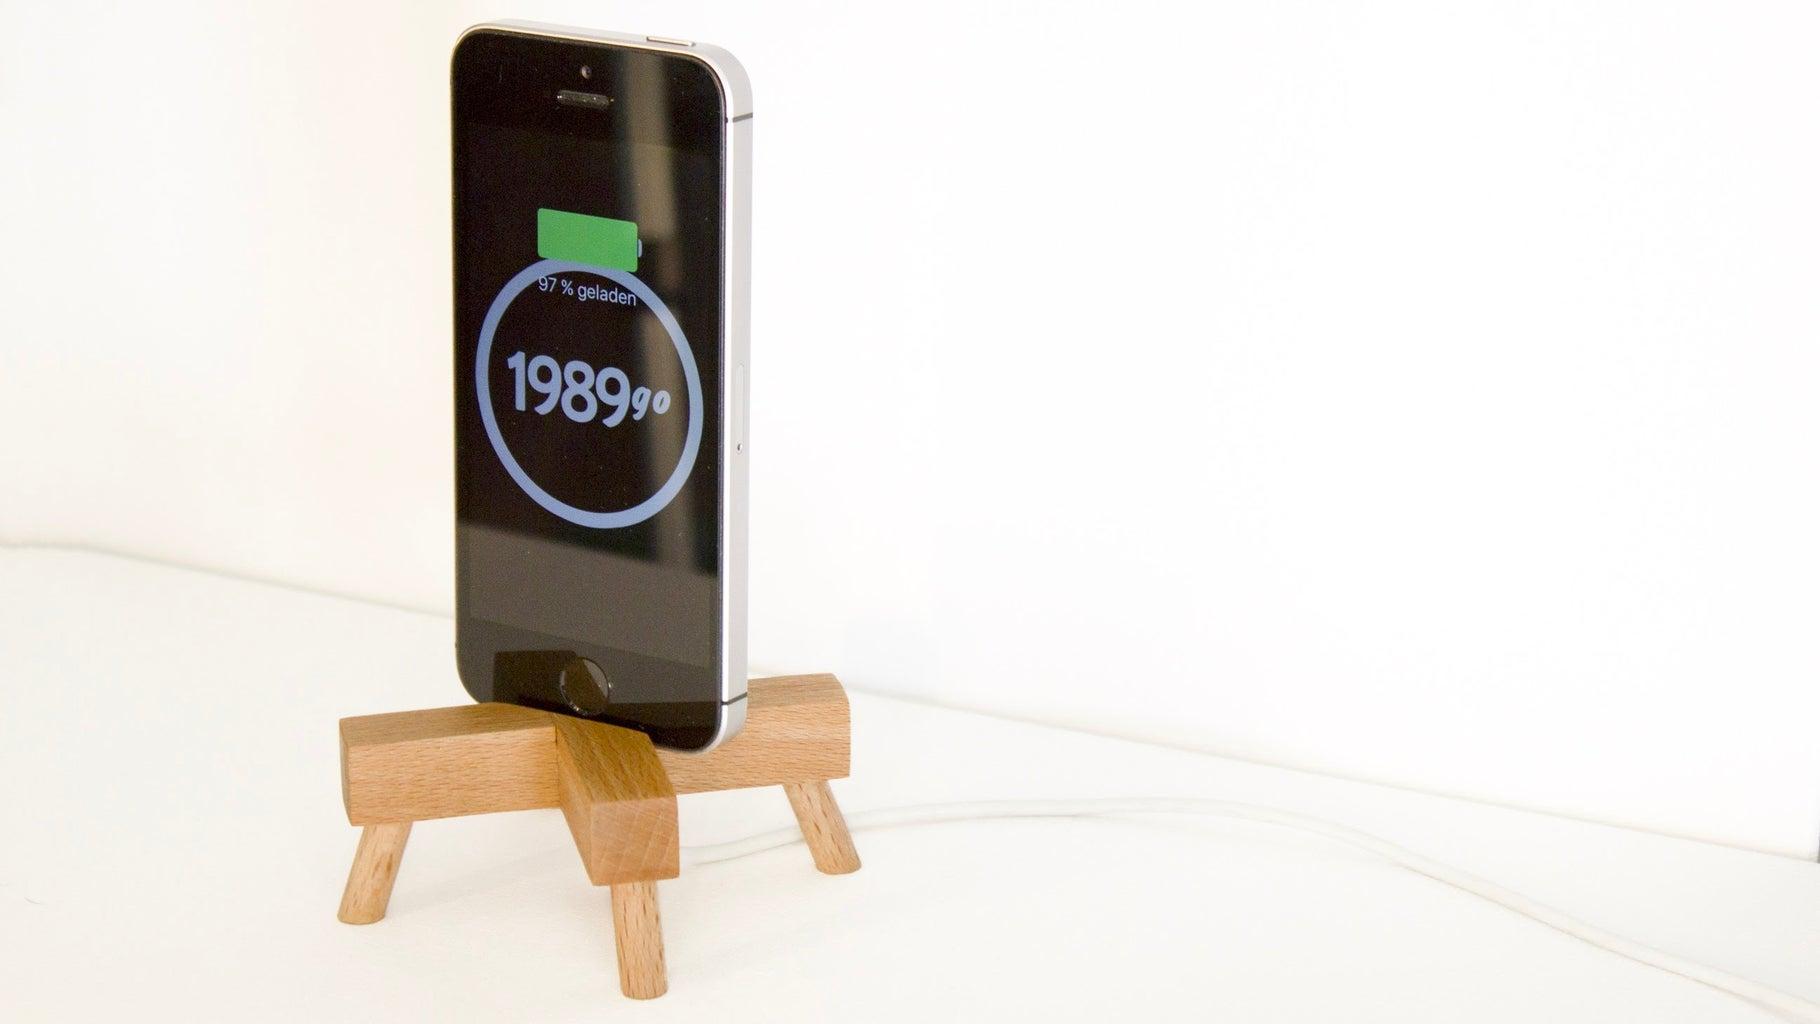 X-Shaped Phone Dock